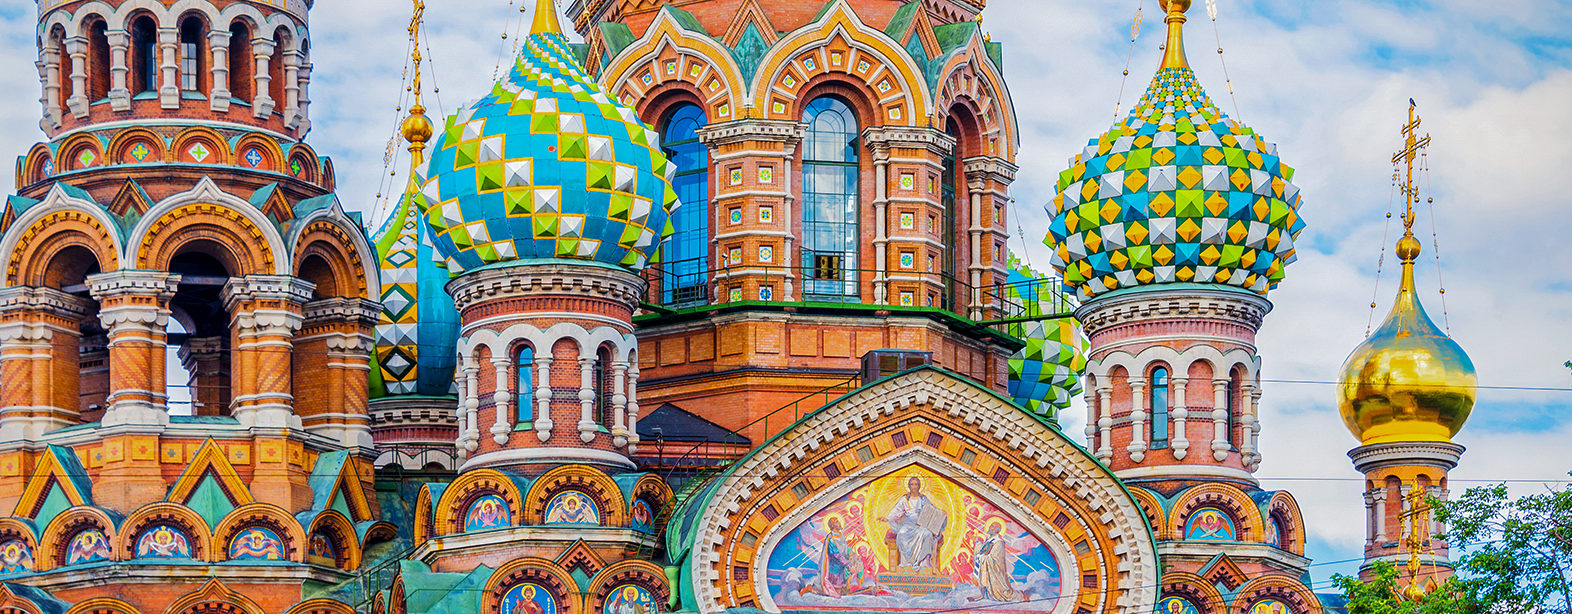 Bluterlöserkirche St. Petersburg